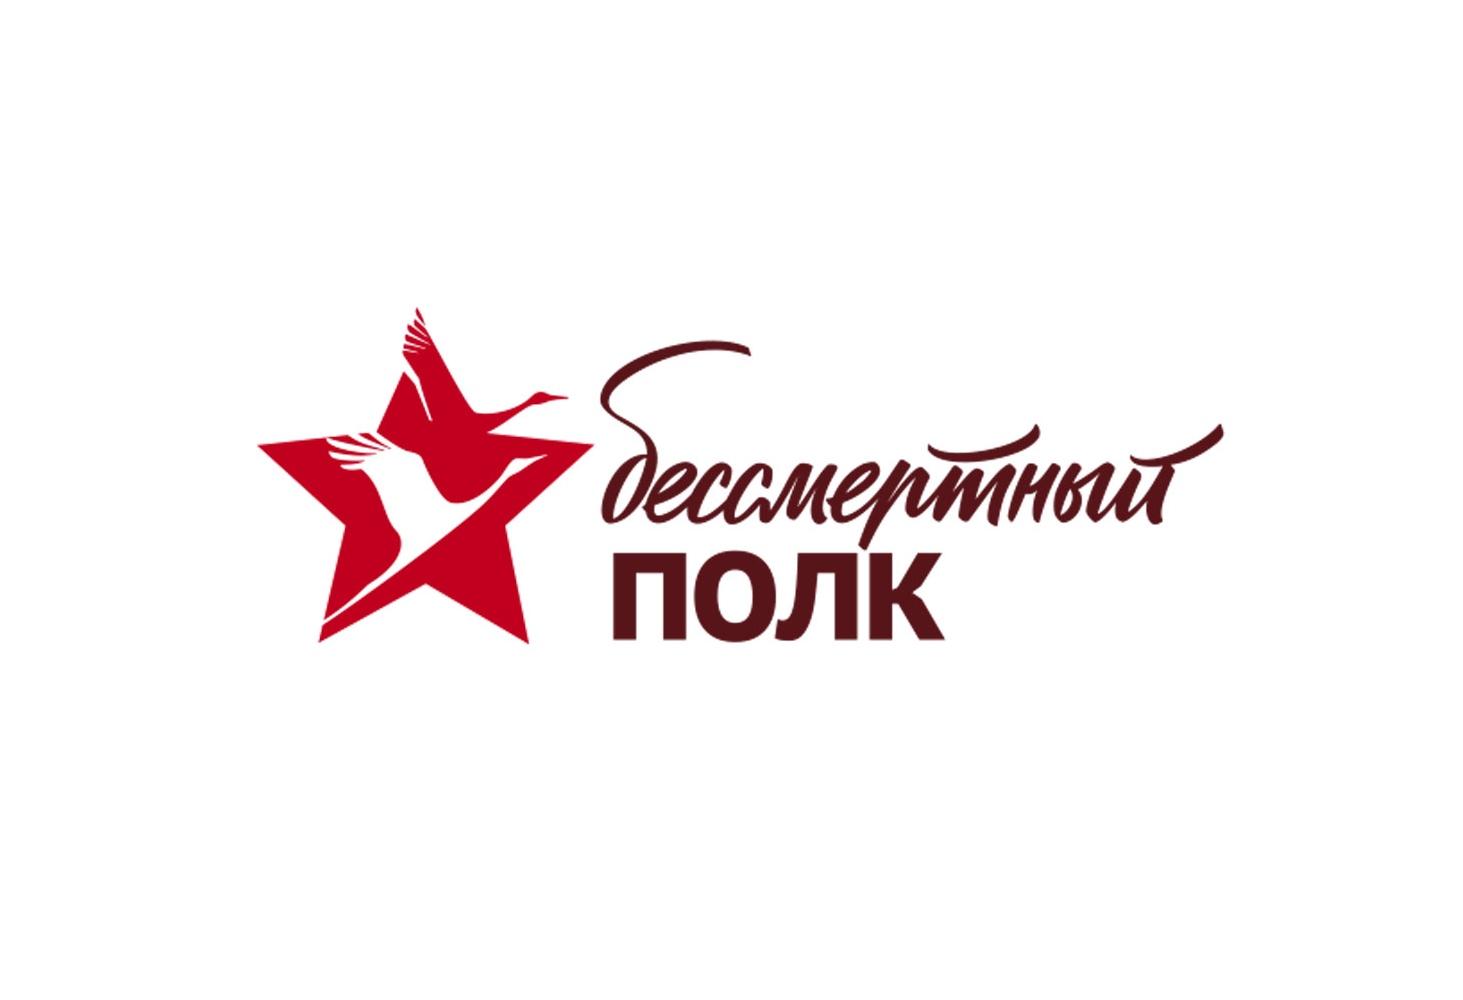 moj-dedushka-zvonarev-egor-sergeevich